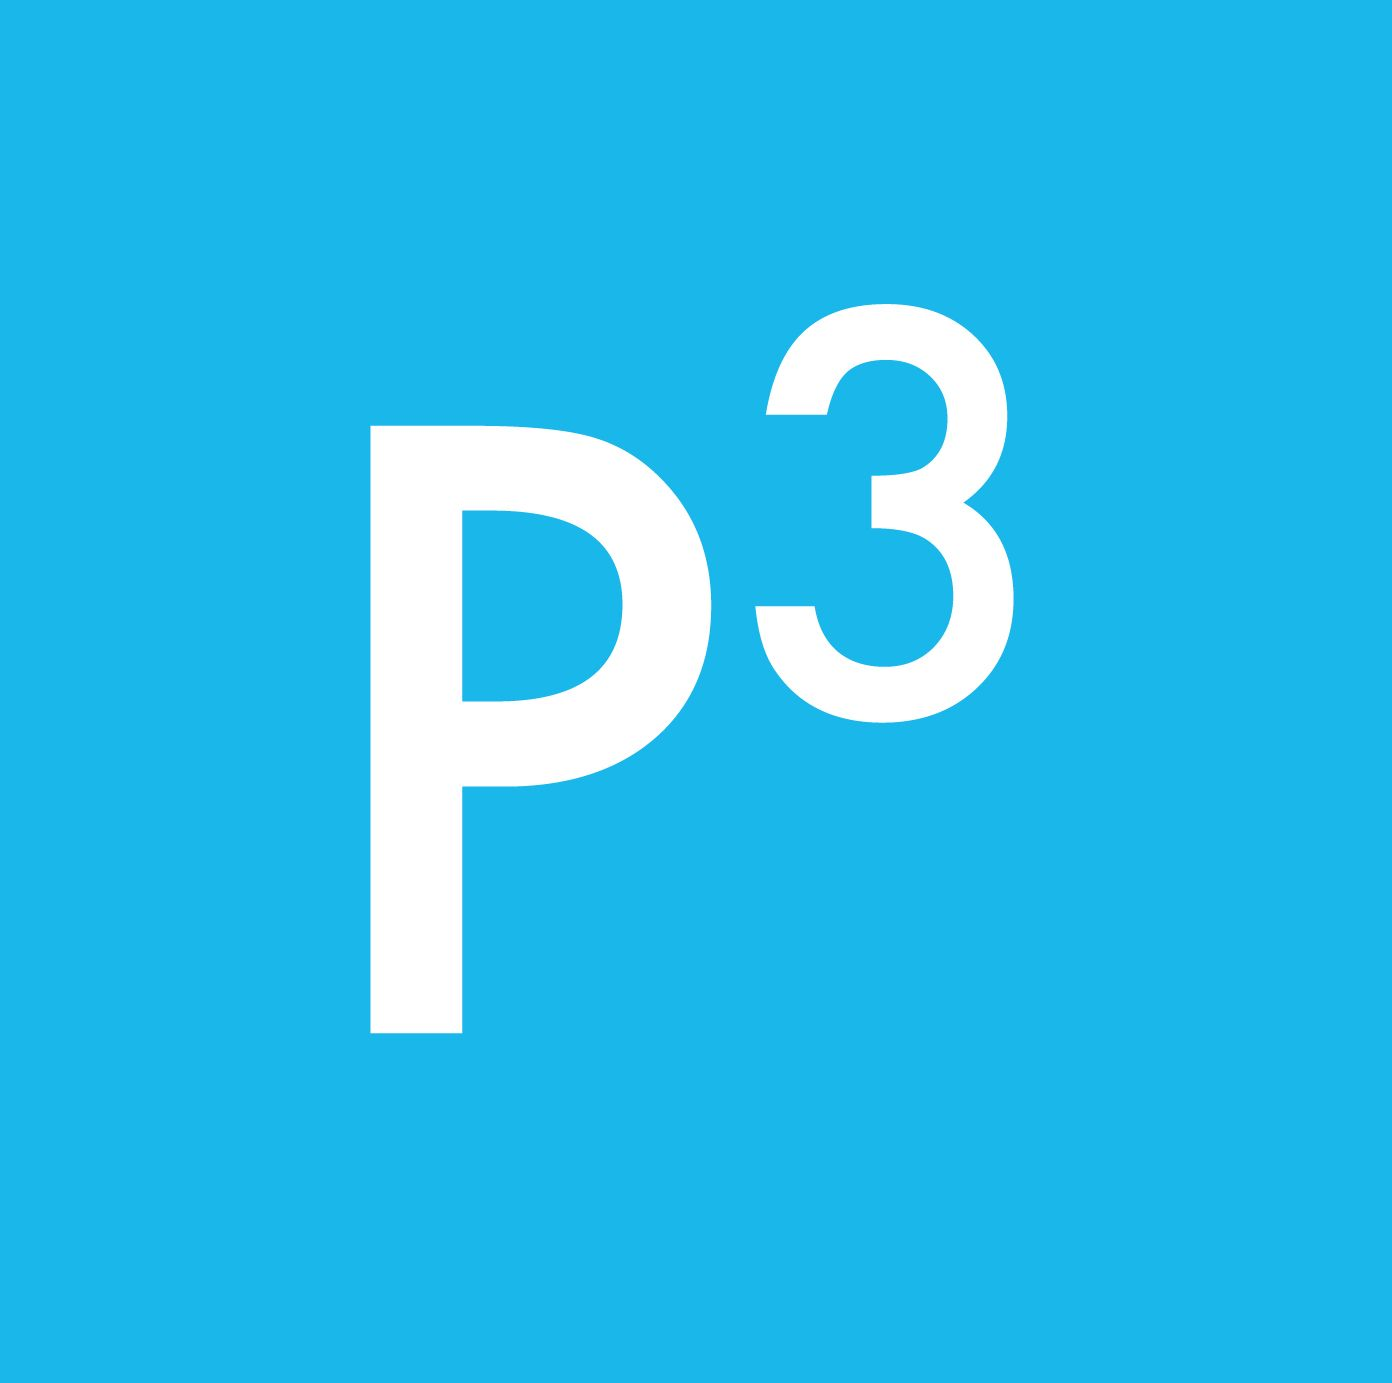 P3 Medical